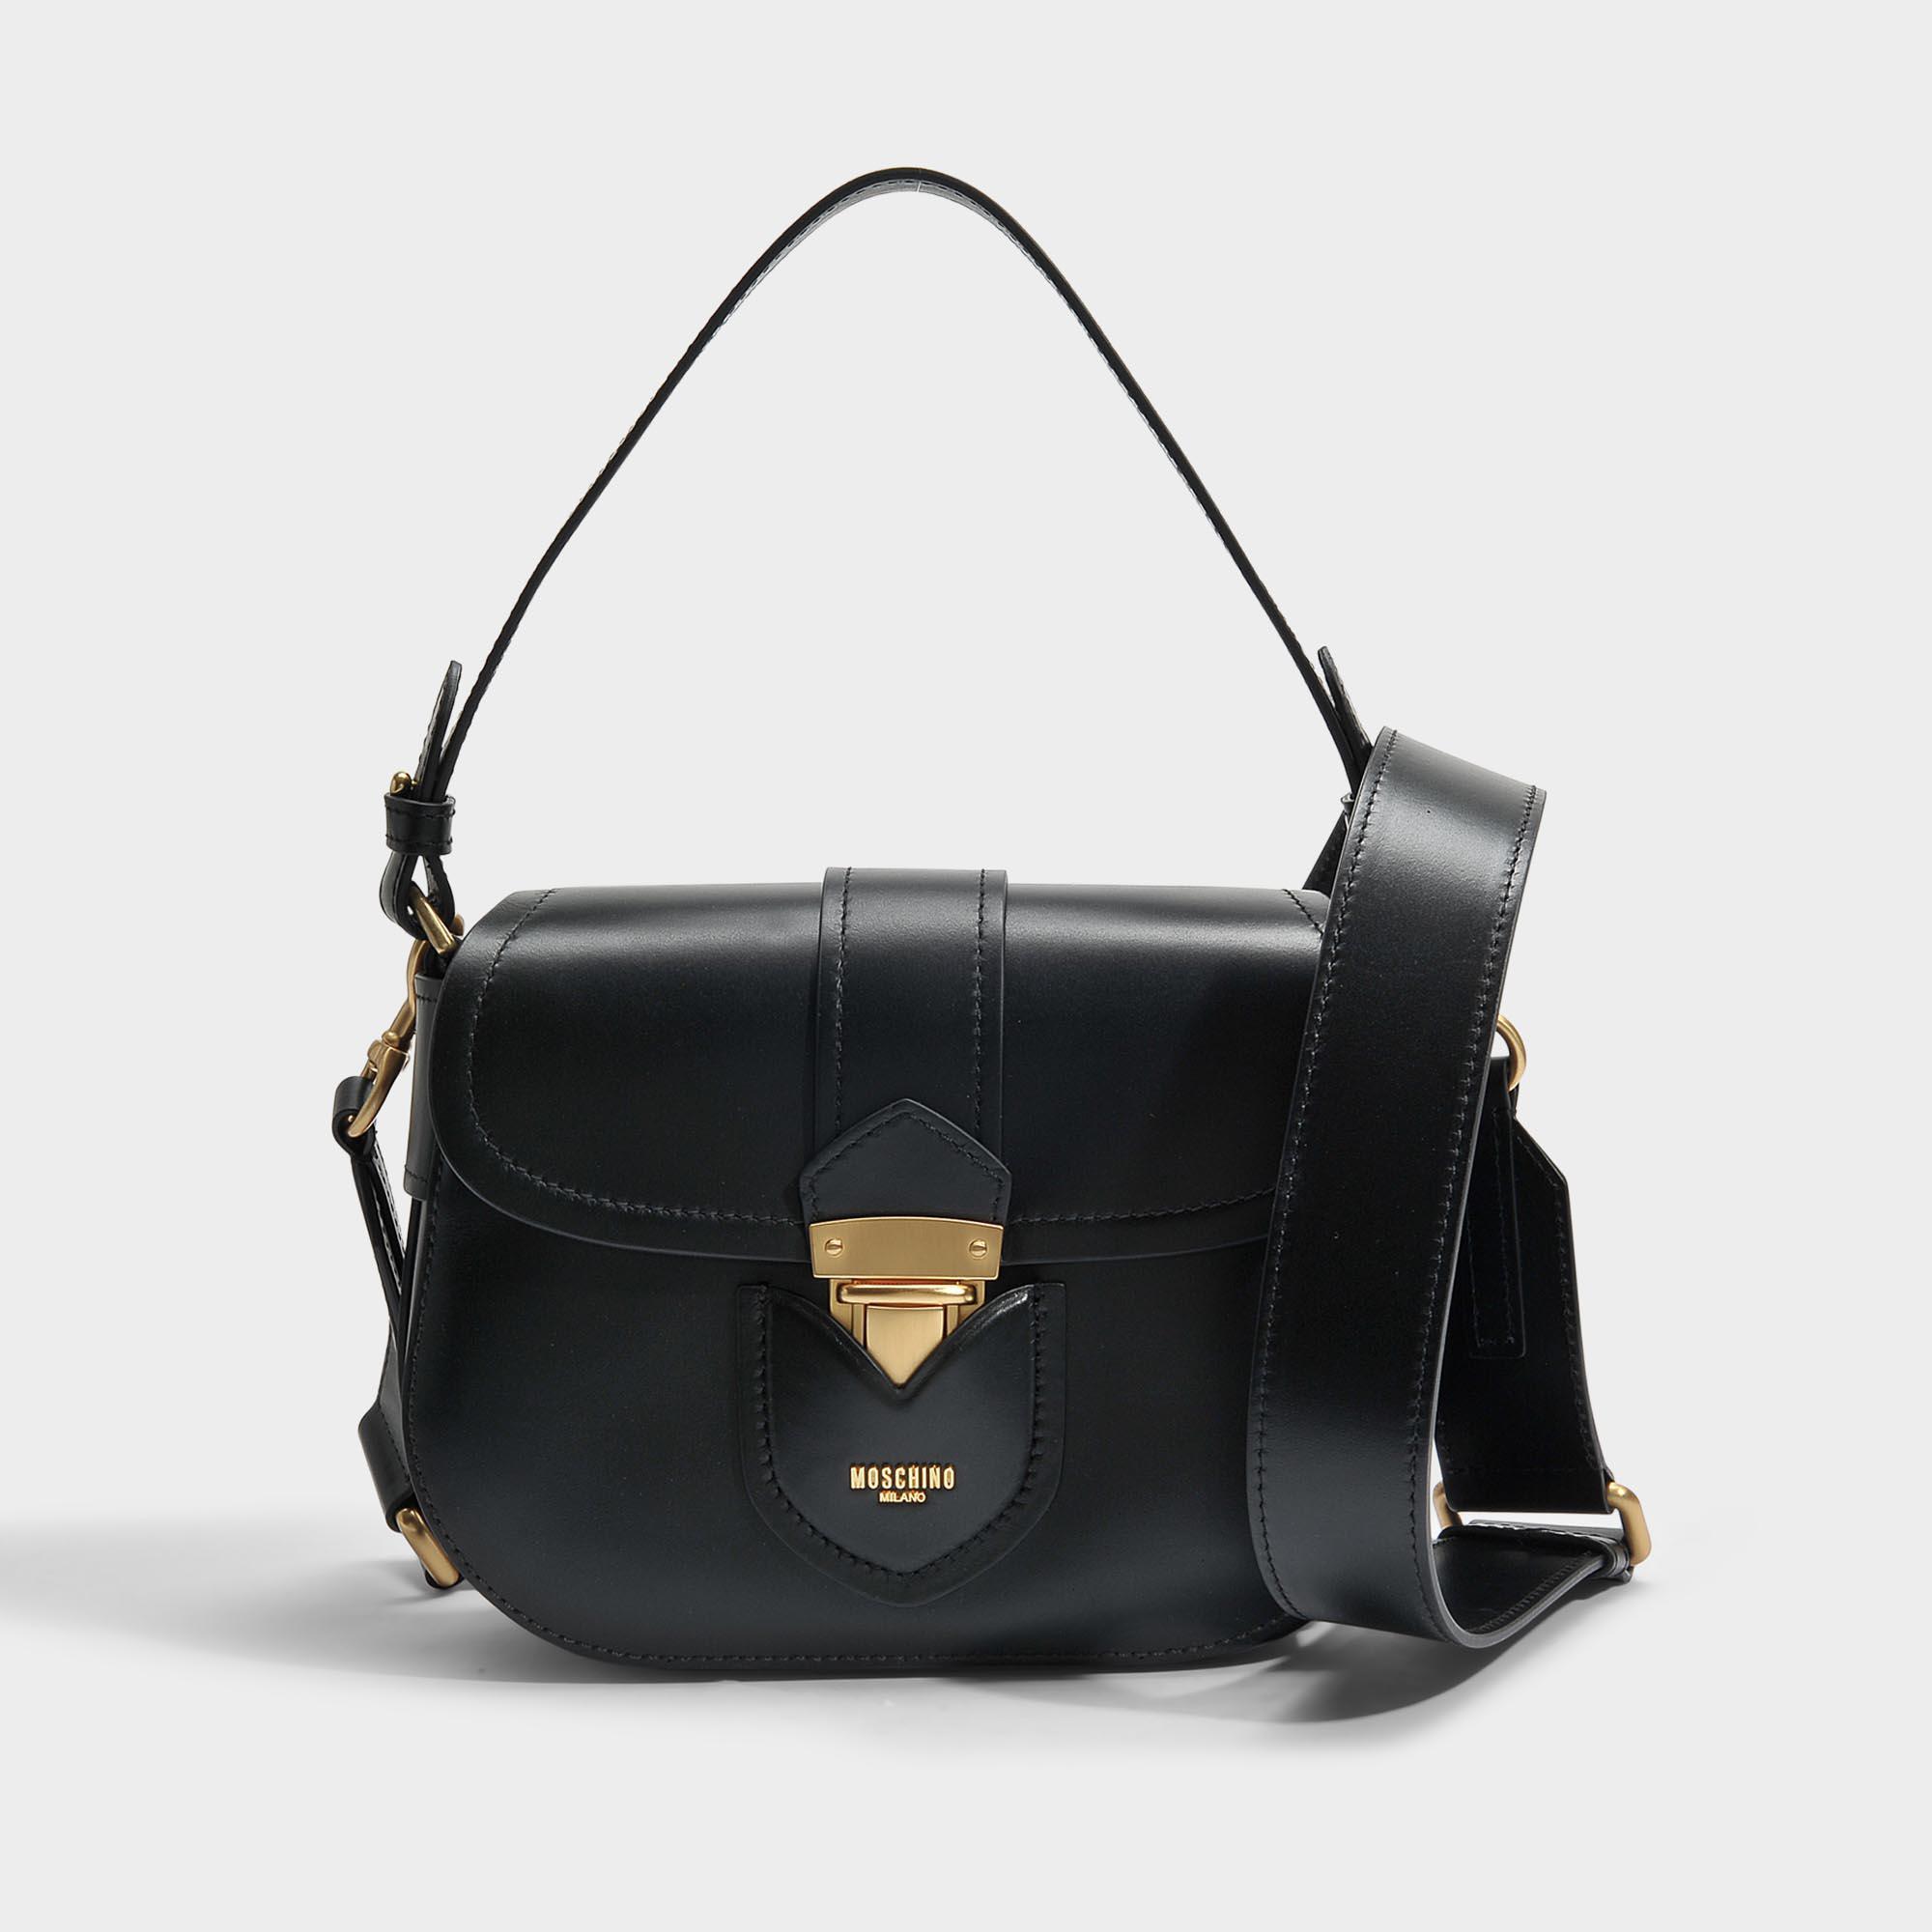 Hidden Lock Small Shoulder Bag in Black Calfskin Moschino UekXXbO7I